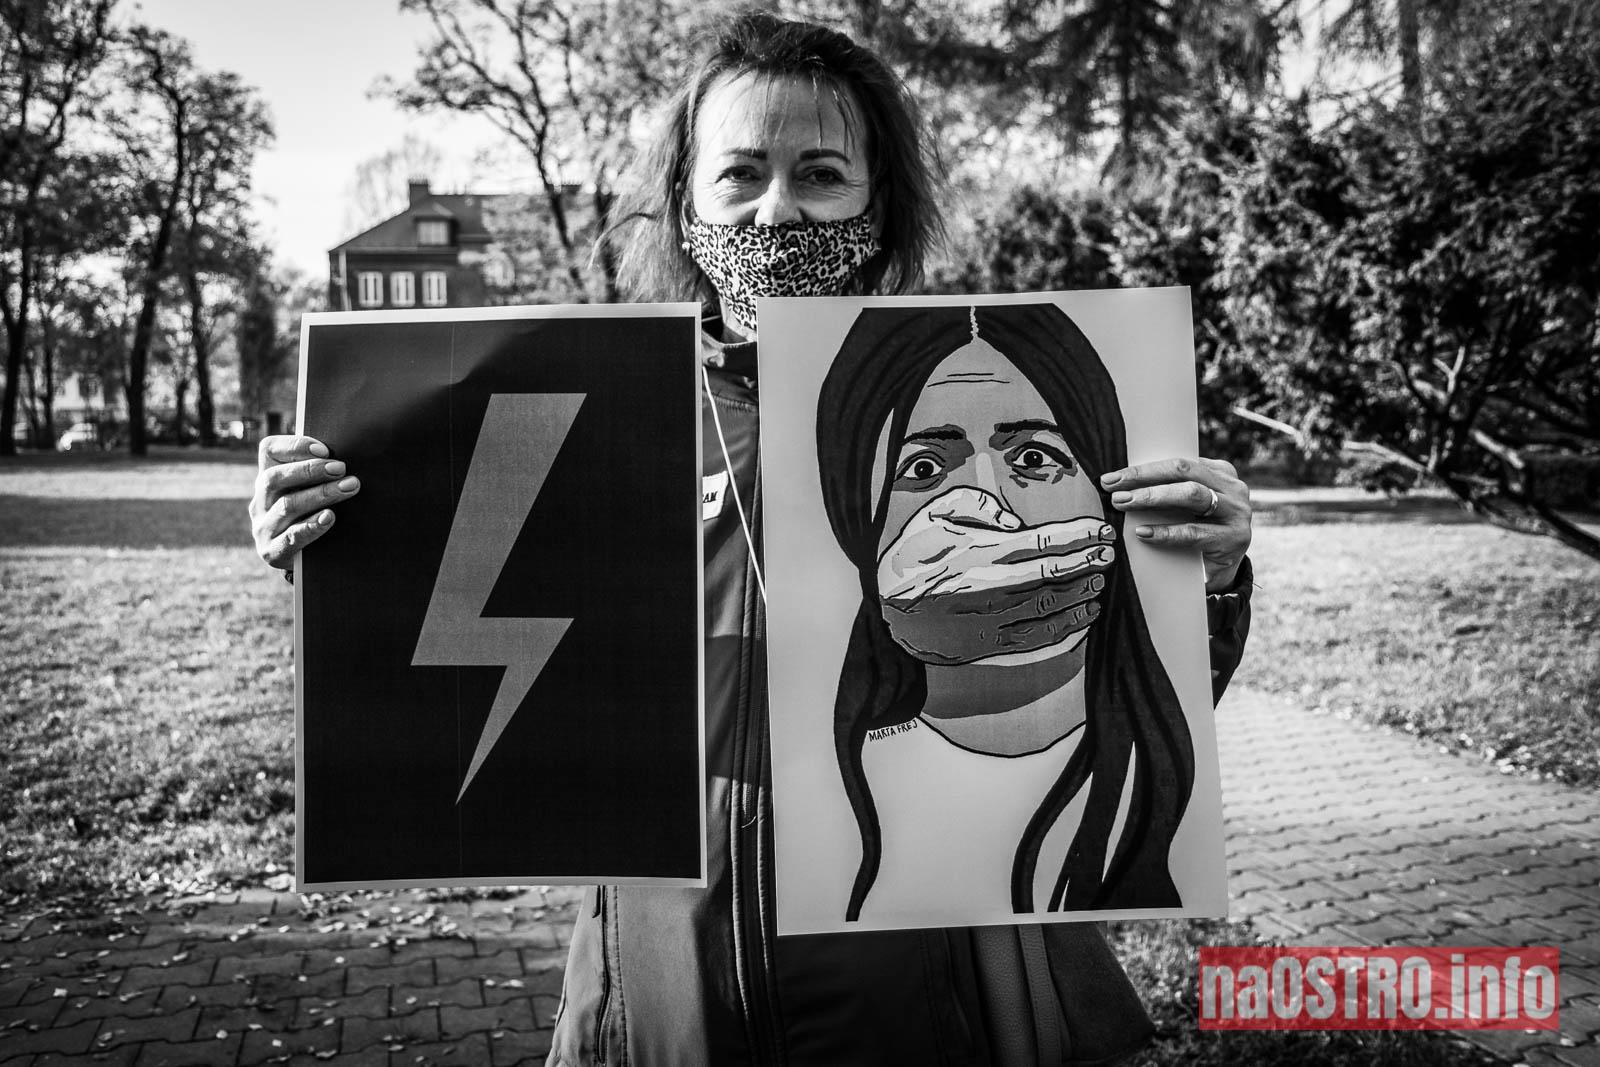 NaOSTROinfo Strajk Kobiet-5